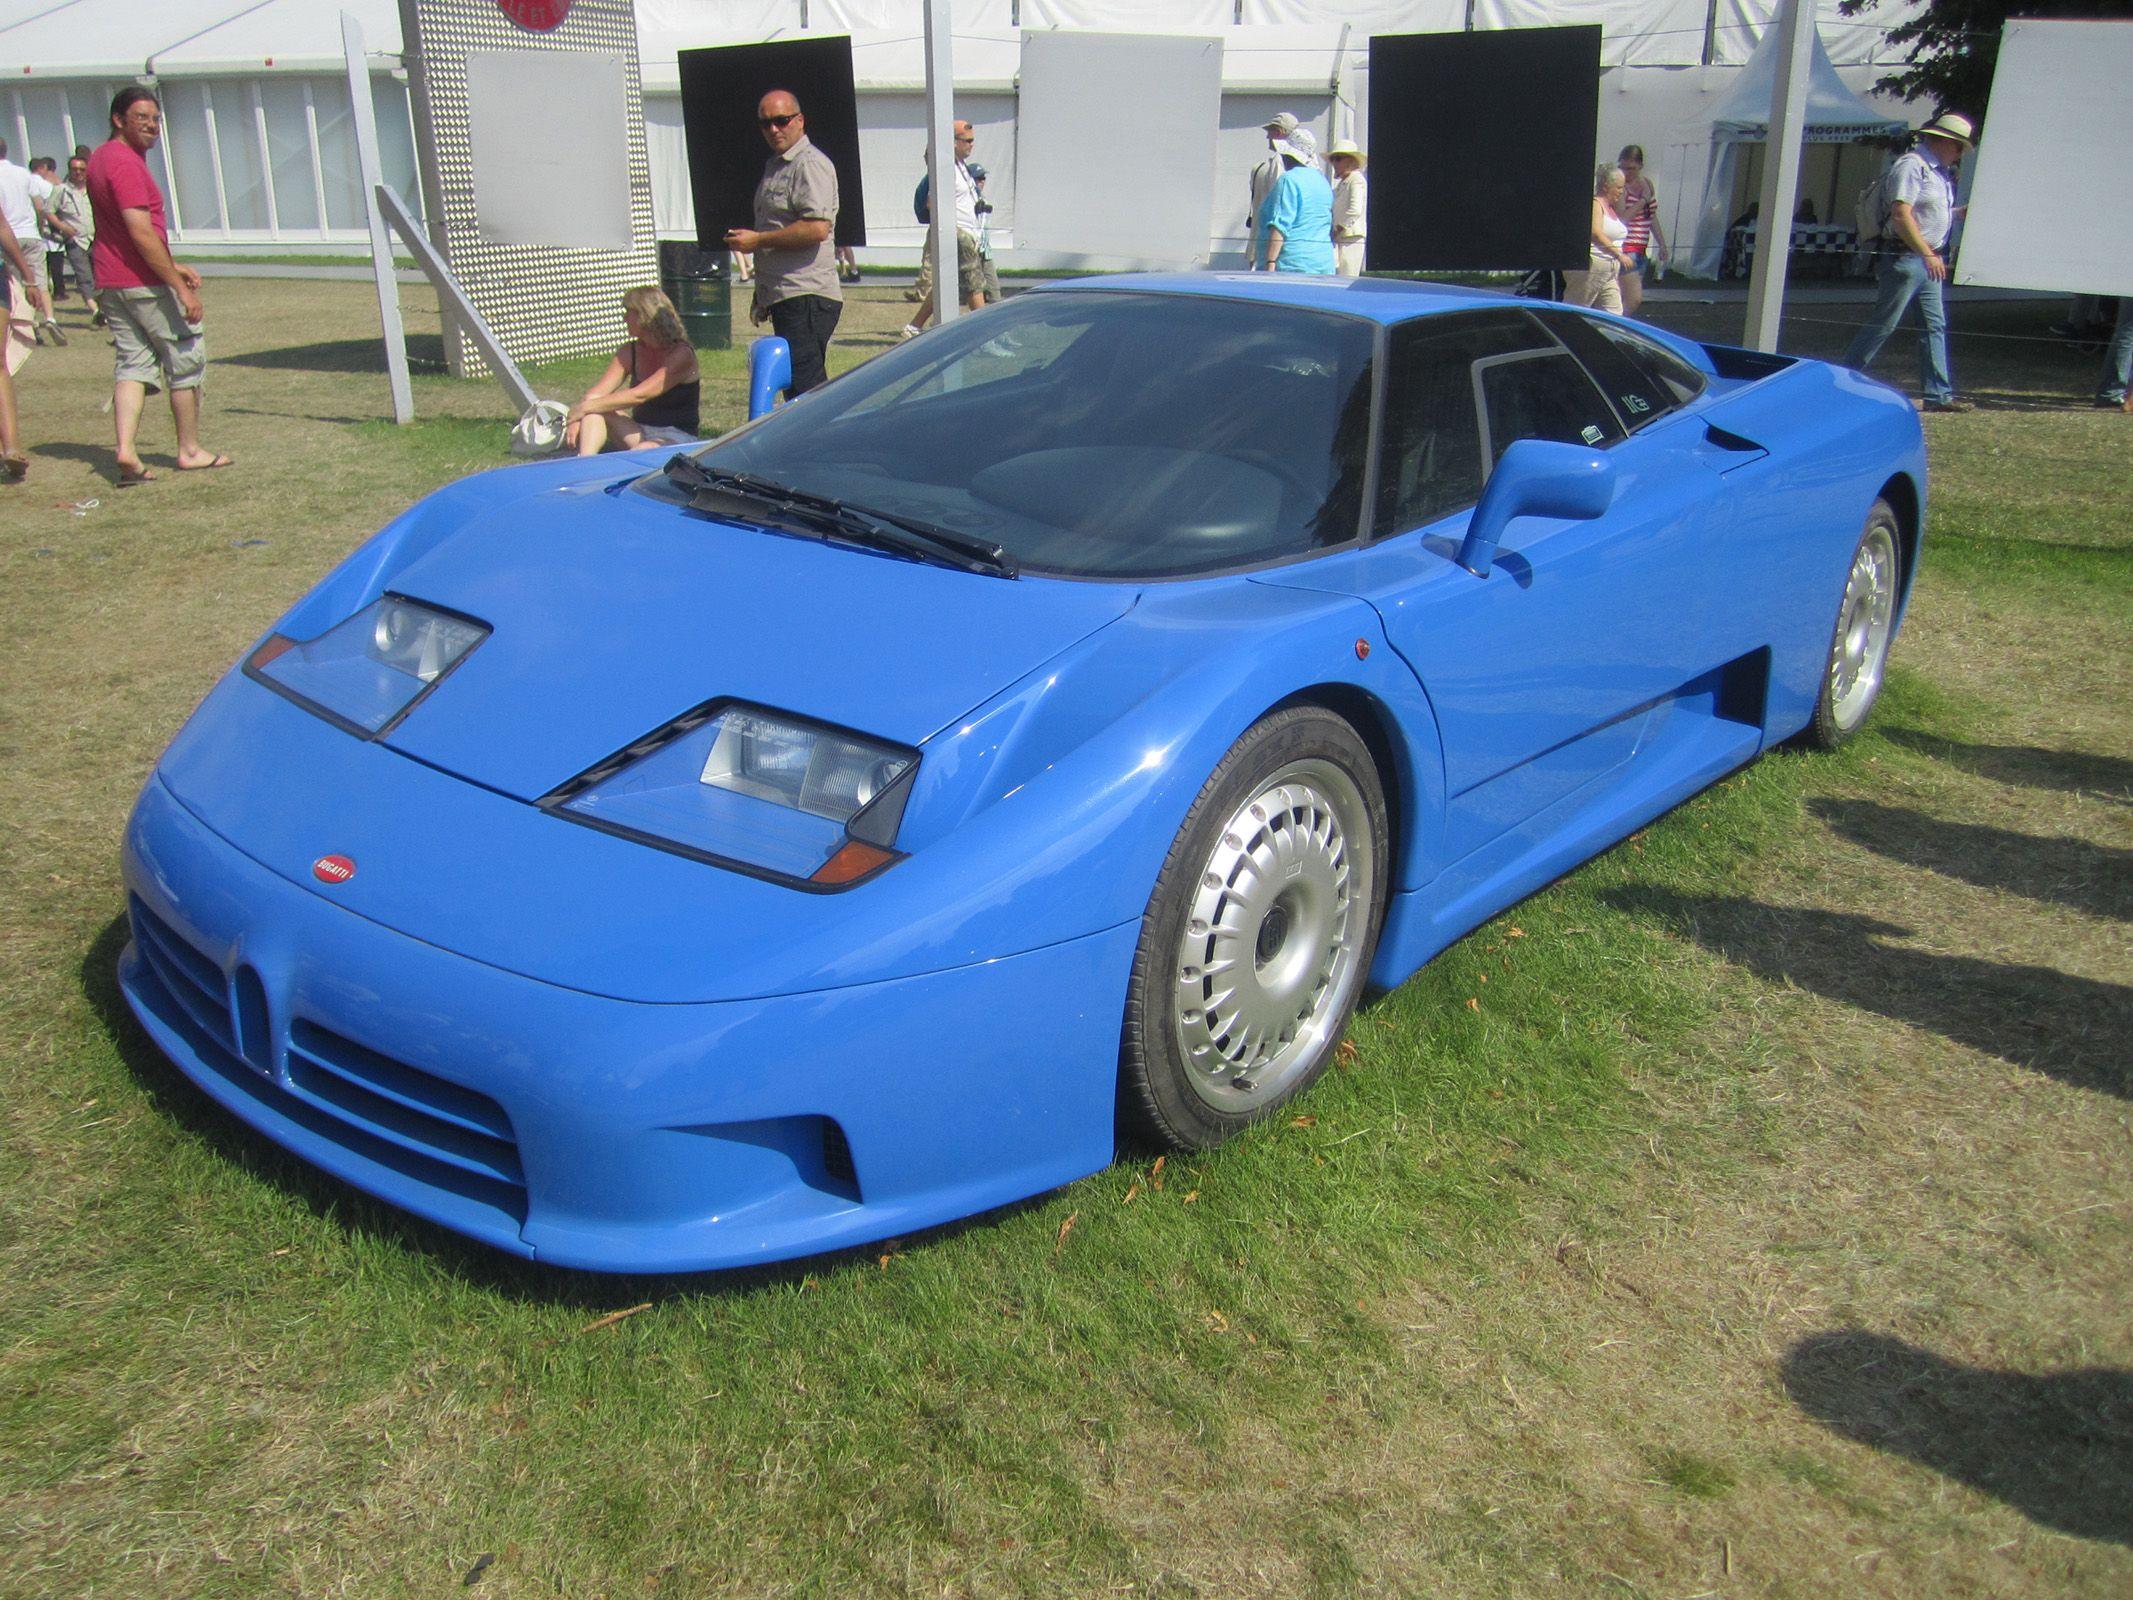 f21c378229009553af6bc2b06bb60290 Fabulous Ferrari Mondial T In Vendita Cars Trend